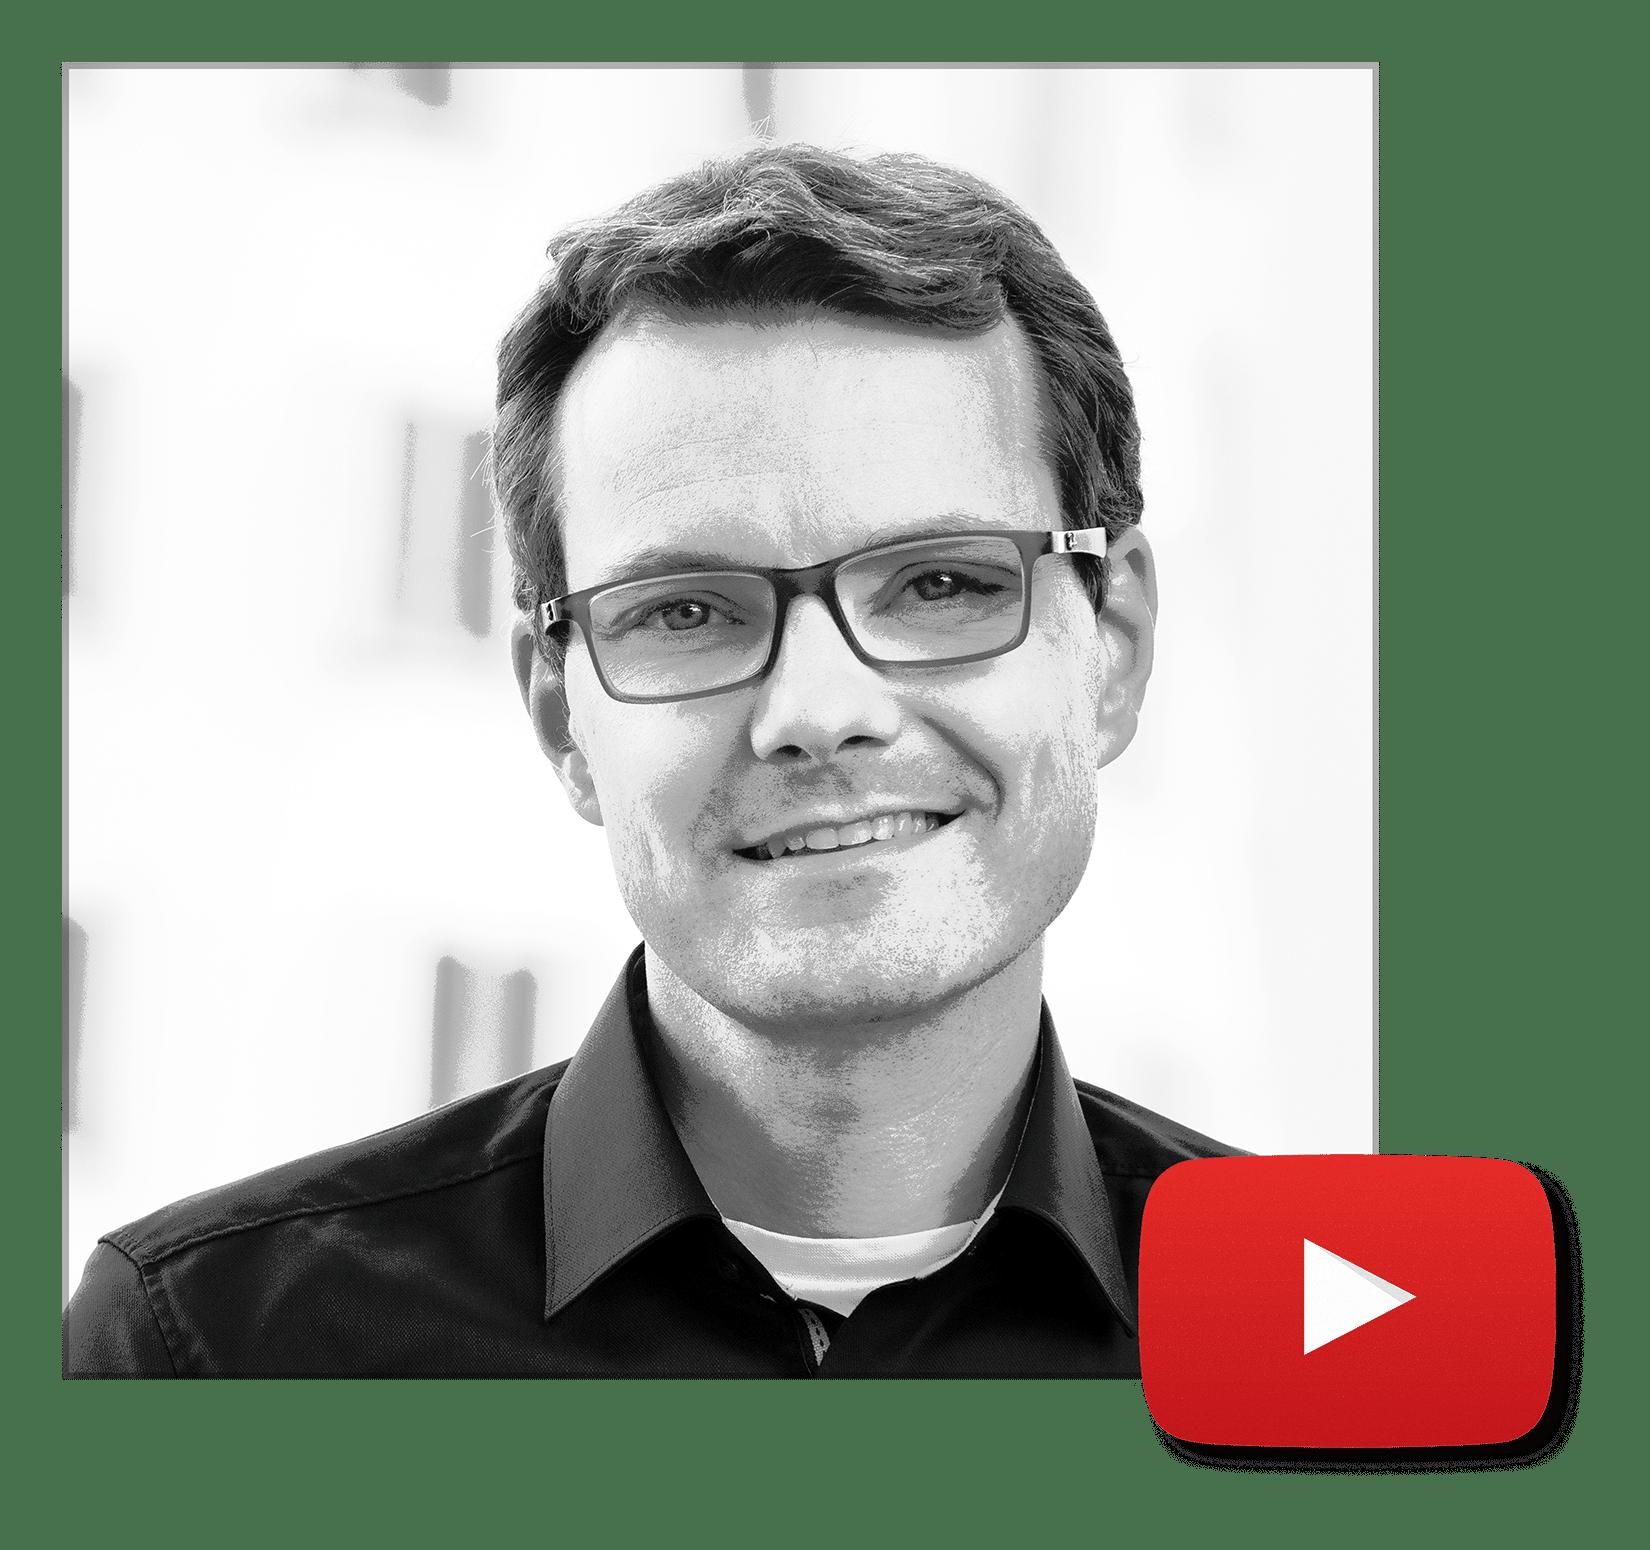 Video Youtube Michael Goldnau Kardiologe Präventivmedizin